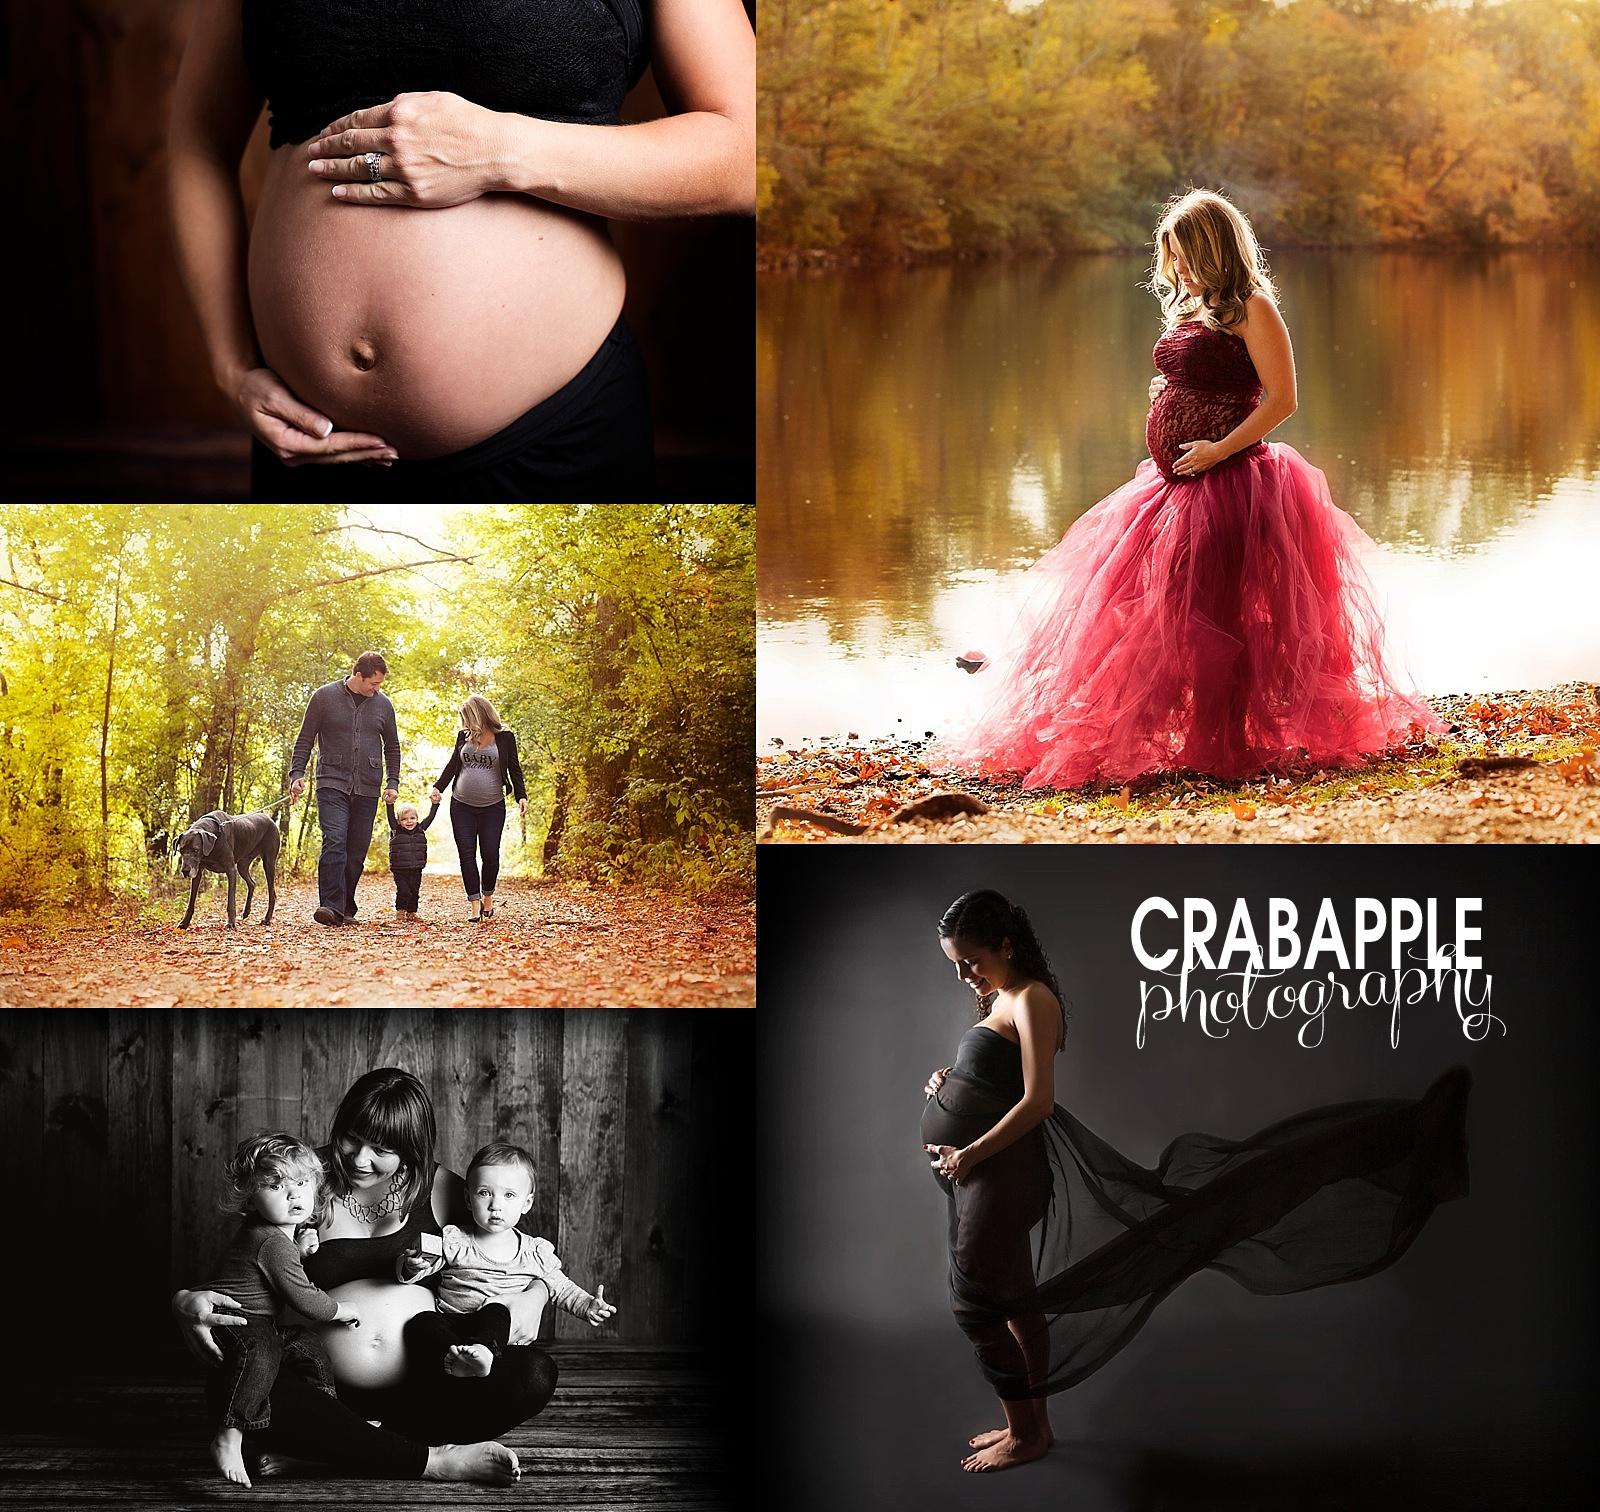 Crabapple Photography